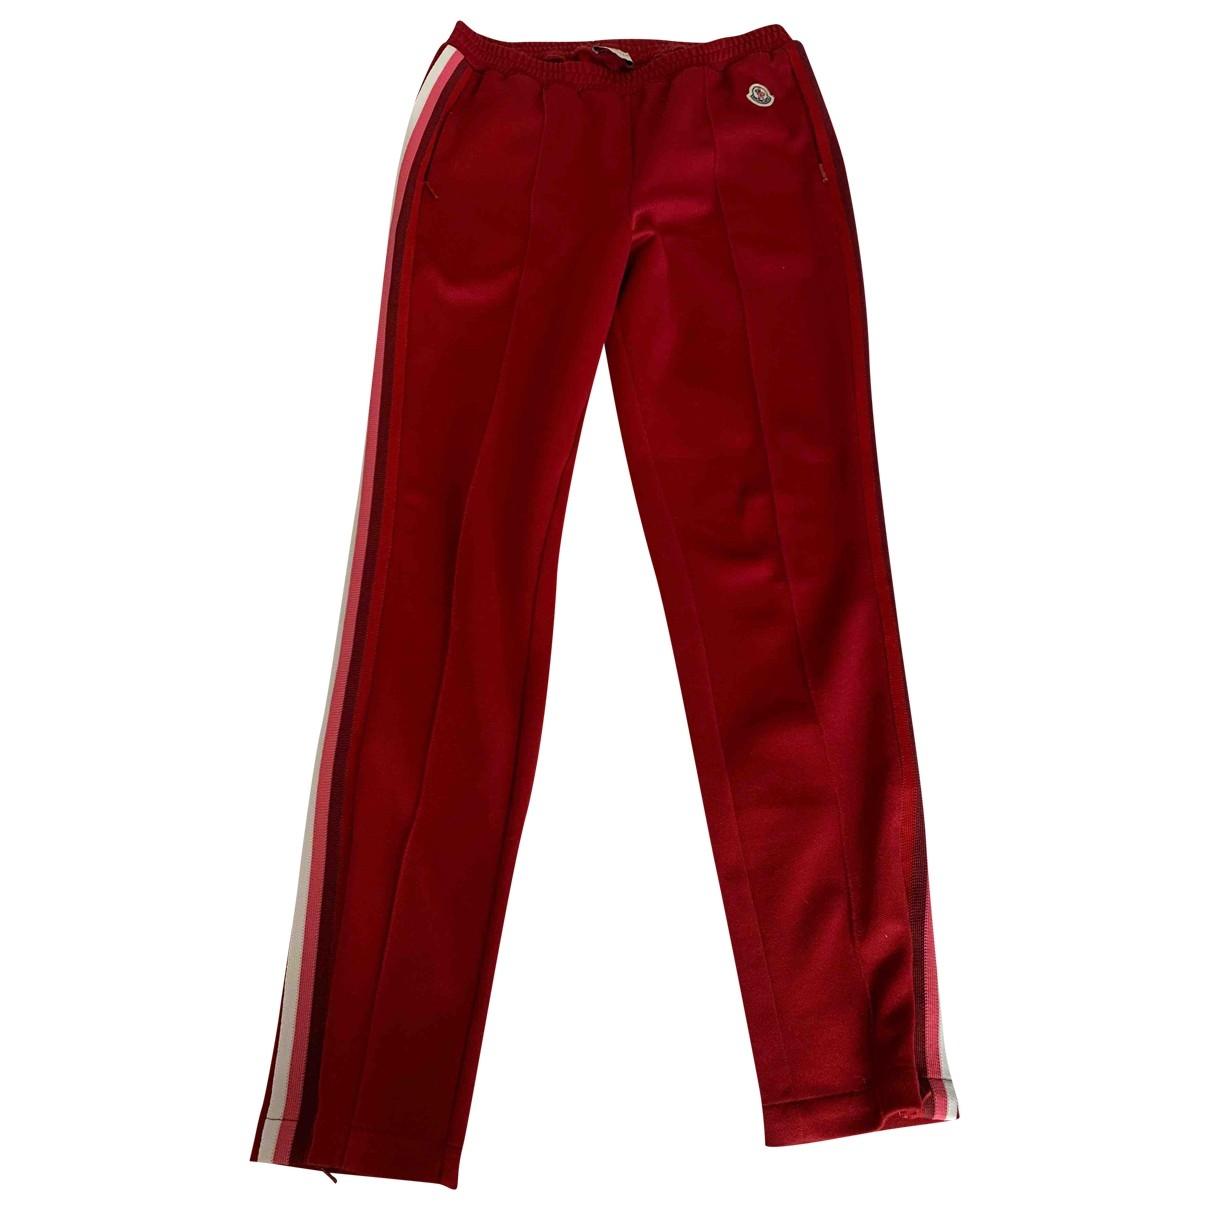 Moncler \N Burgundy Trousers for Women XS International